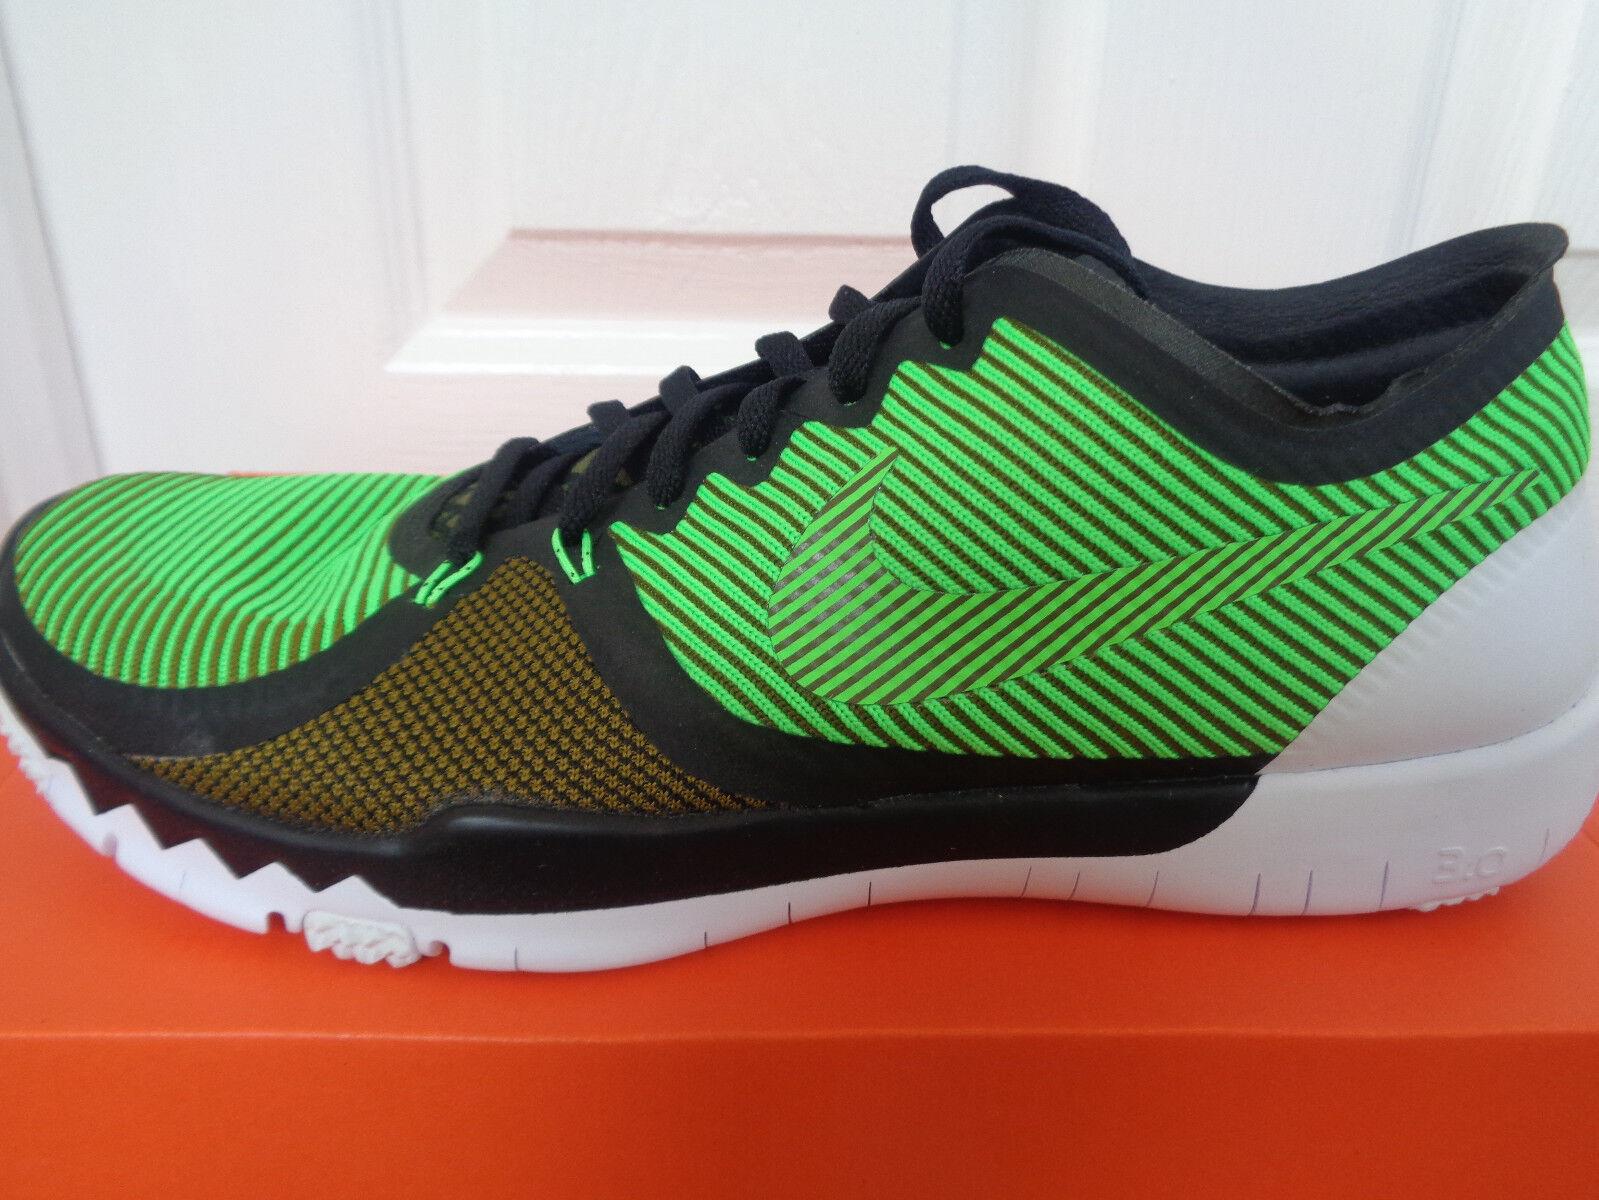 Nike Free Trainer 3.0 V4 Entrainement Baskets 749361 033uk 9 UE 44 us 10 Neuf + Boîte